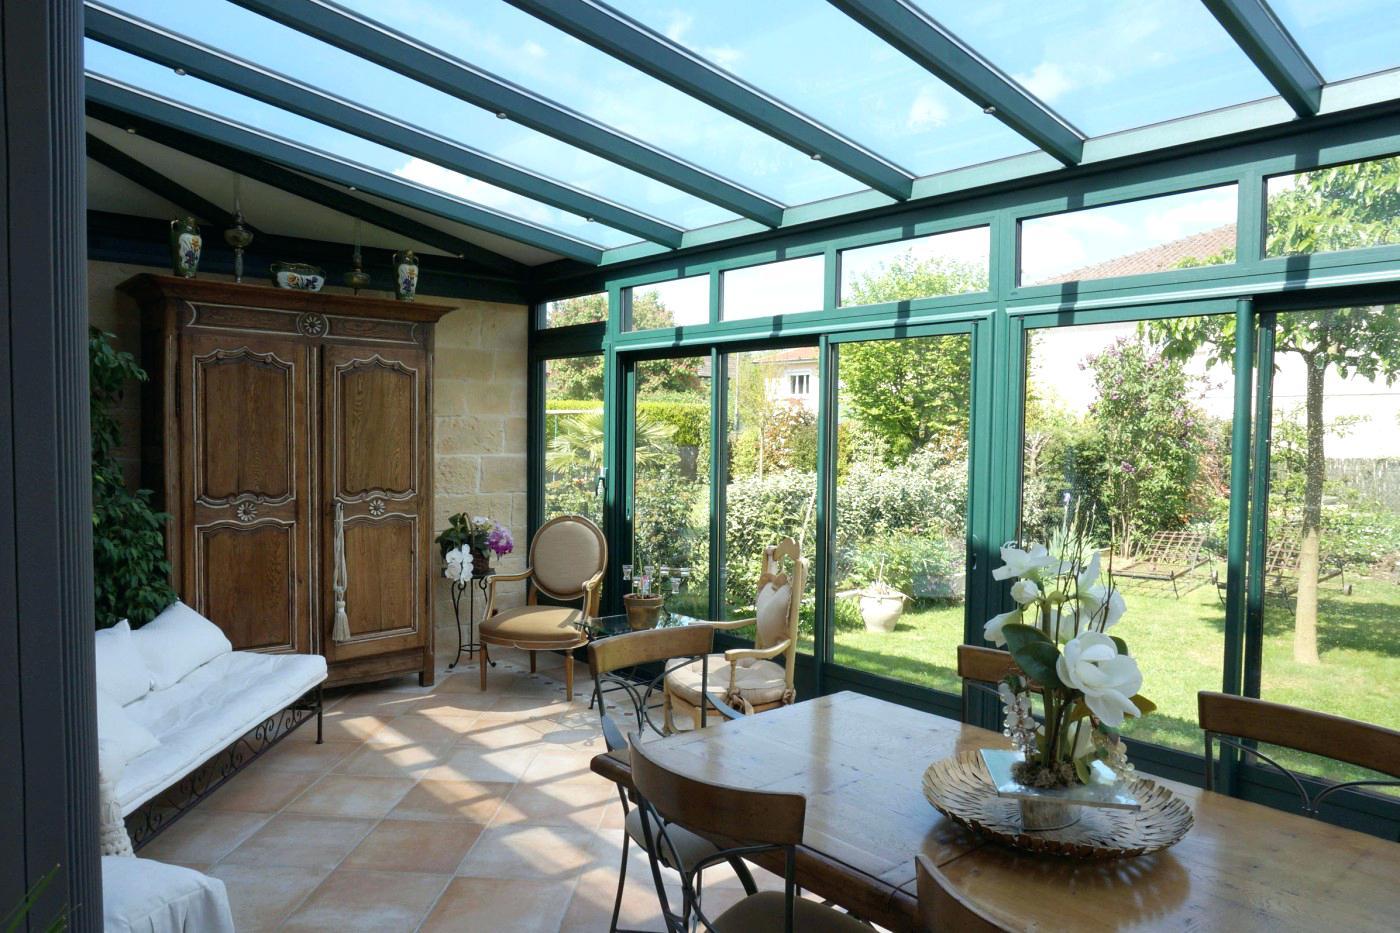 Différence entre jardin d\'hiver et véranda - veranda-styledevie.fr